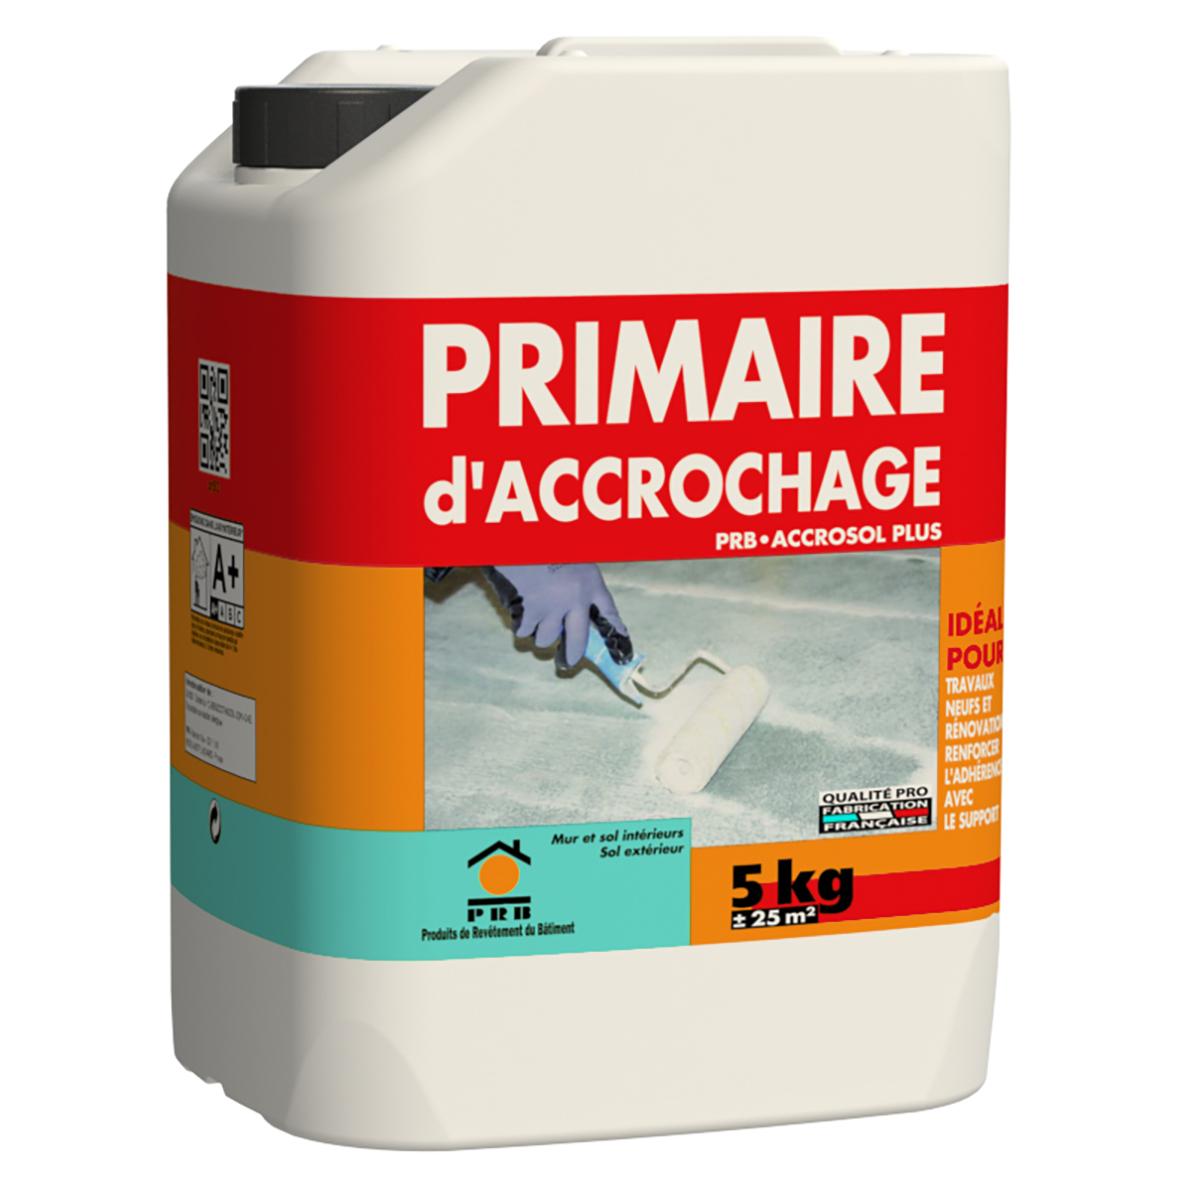 Primaire d accrochage beton beautiful primaire universel - Primaire d accrochage peinture plafond ...